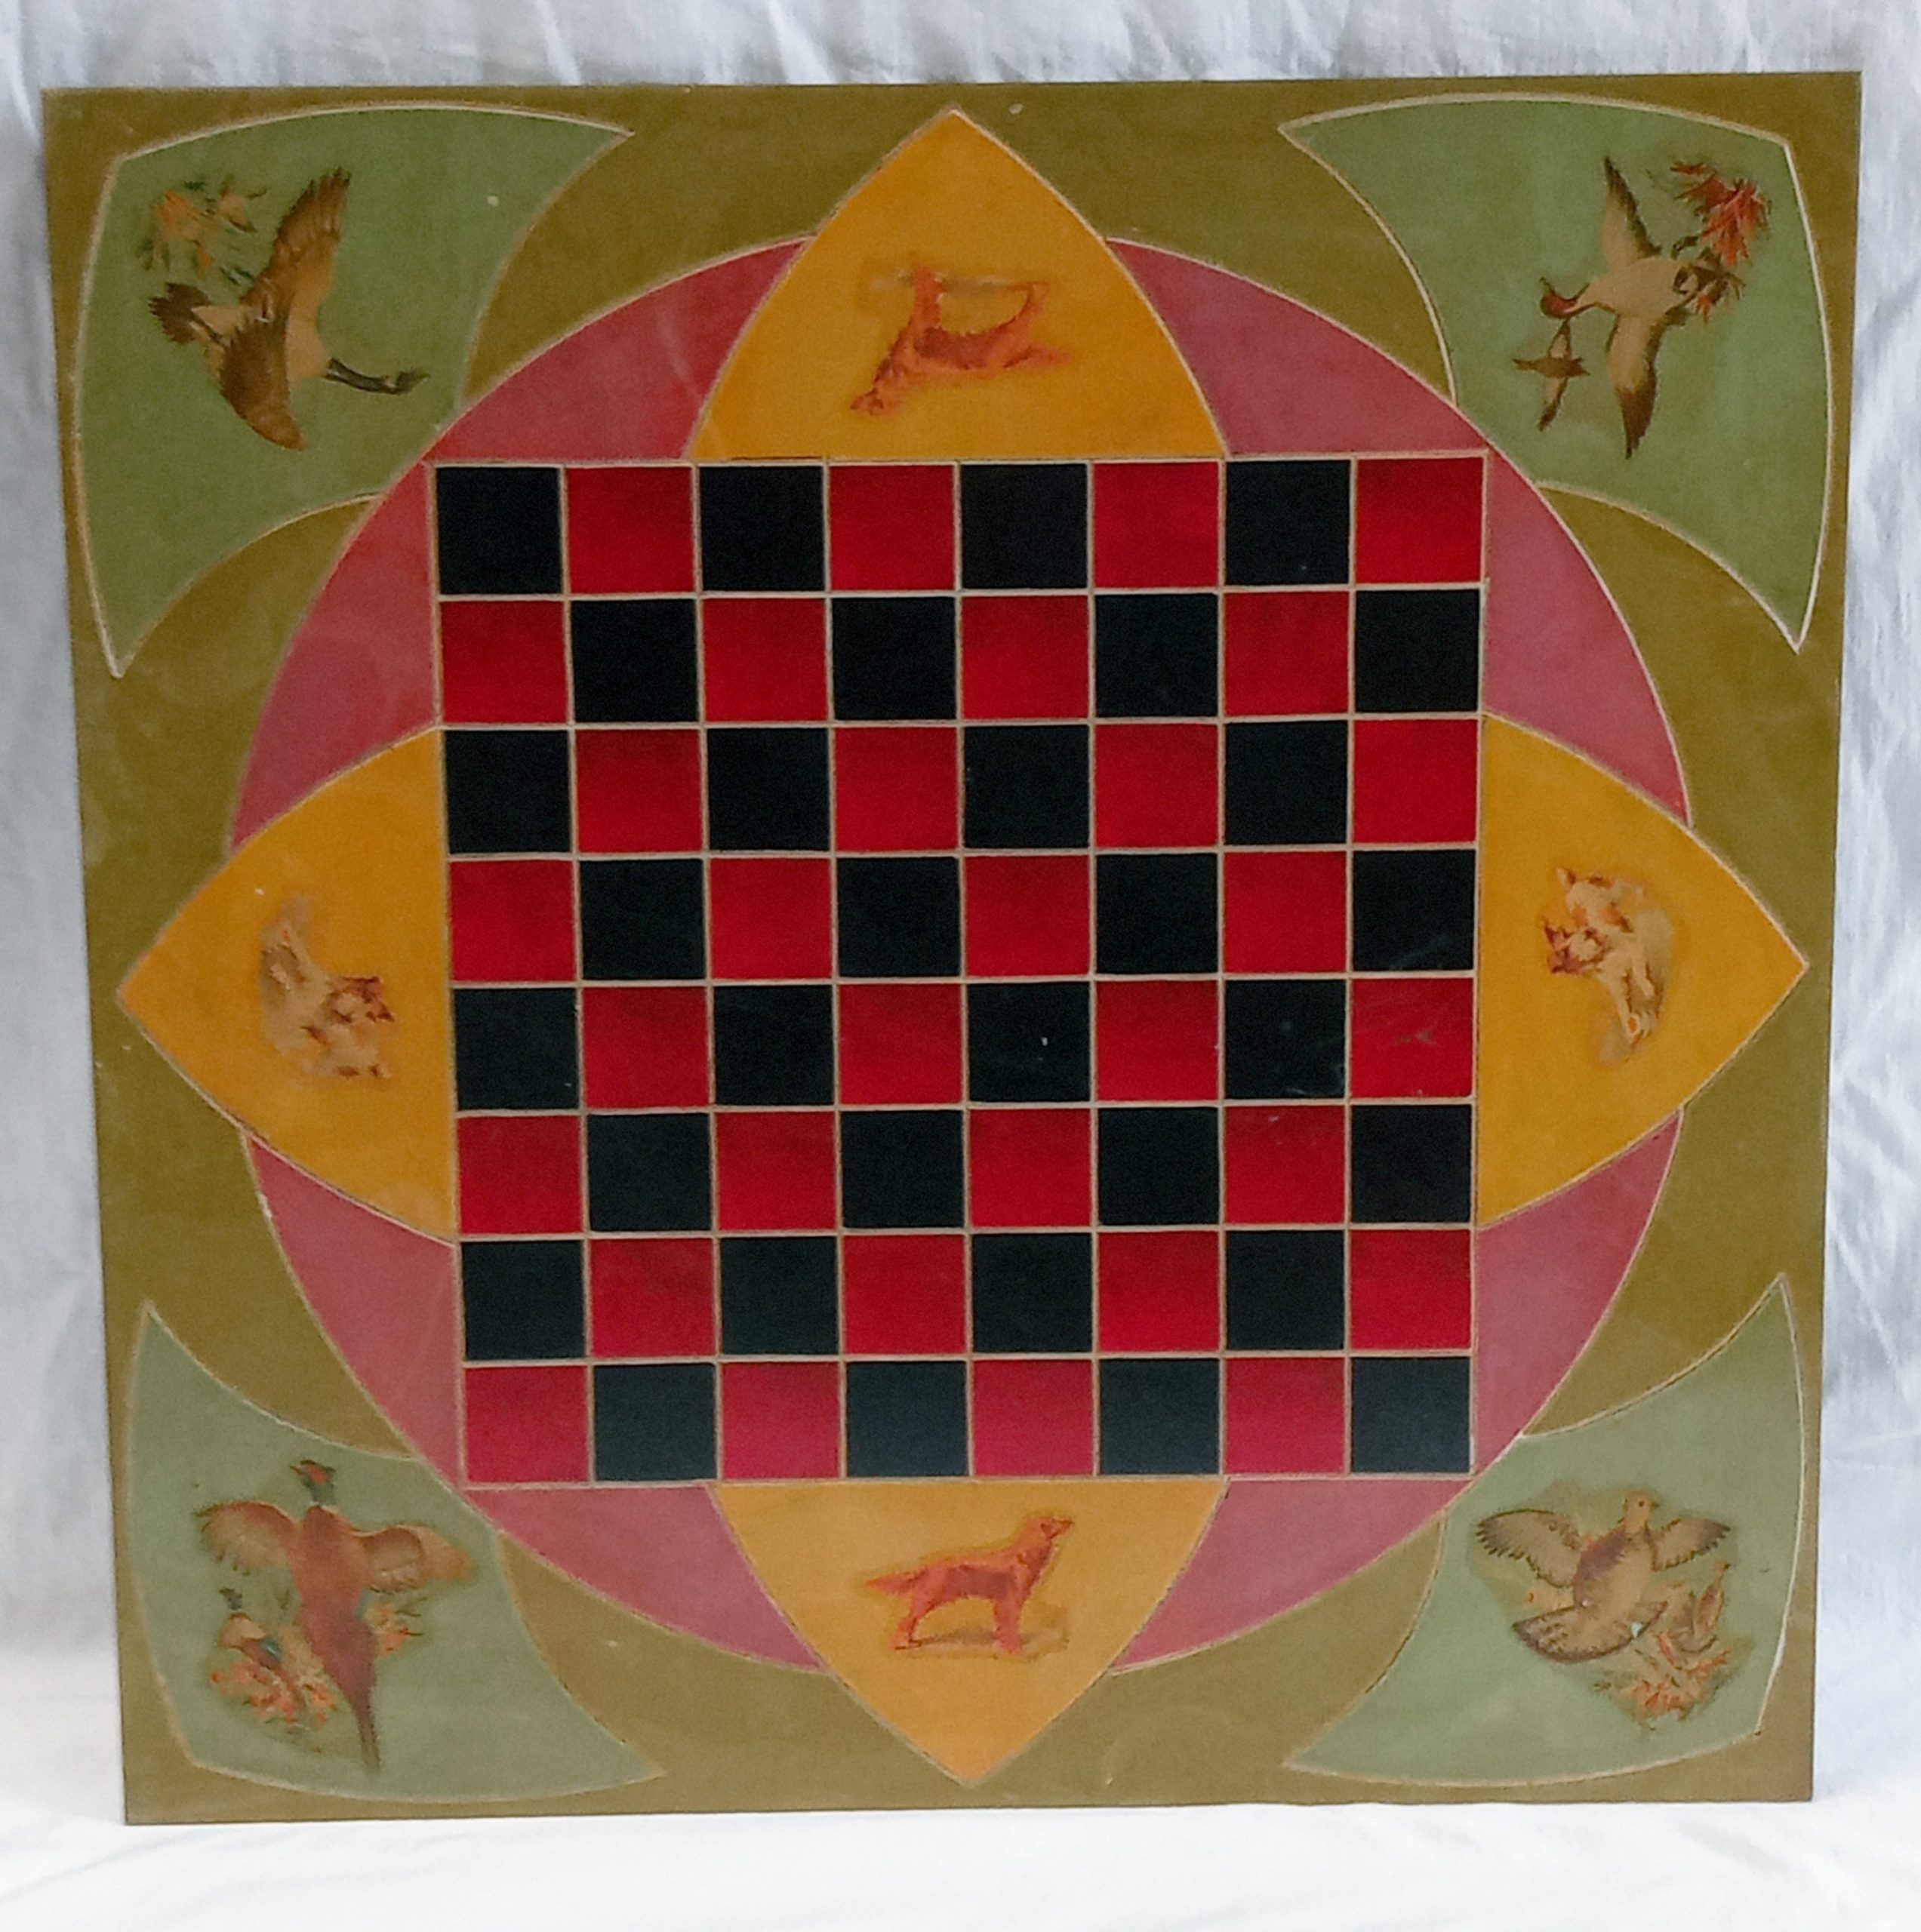 200-36391 Slate Game Board Image